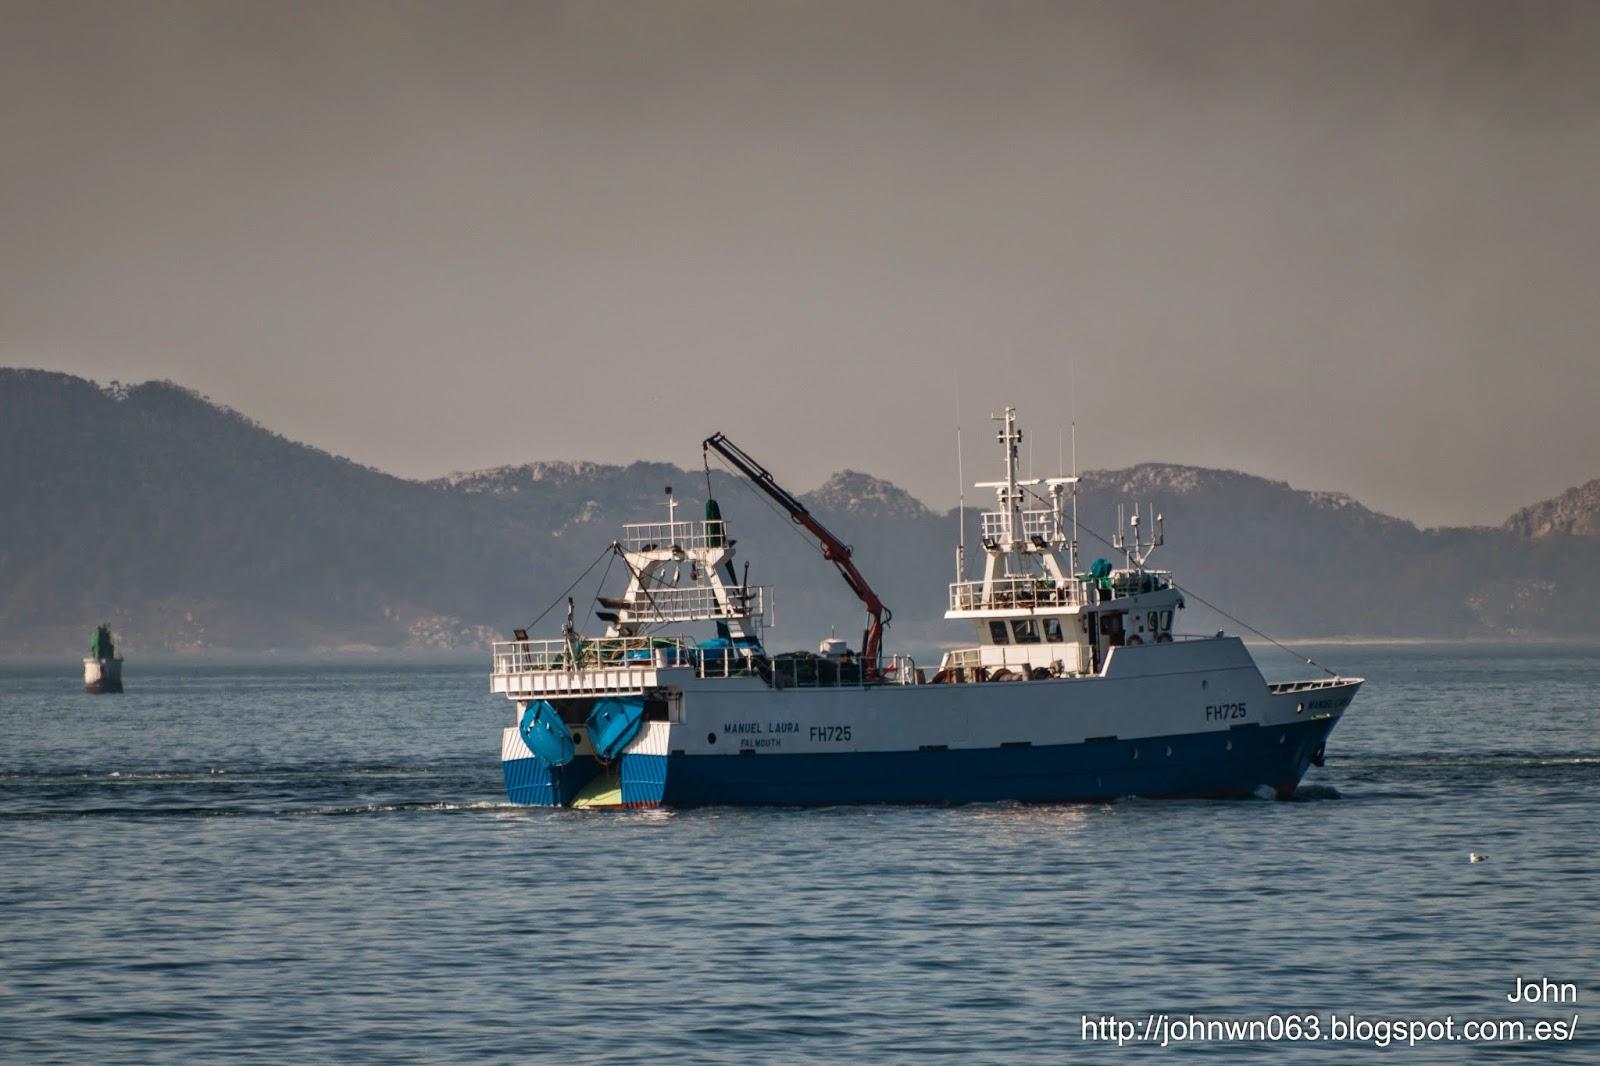 fotos de barcos, manuel laura, imagenes de barcos, arrastrero, vigo, armon, pesquero